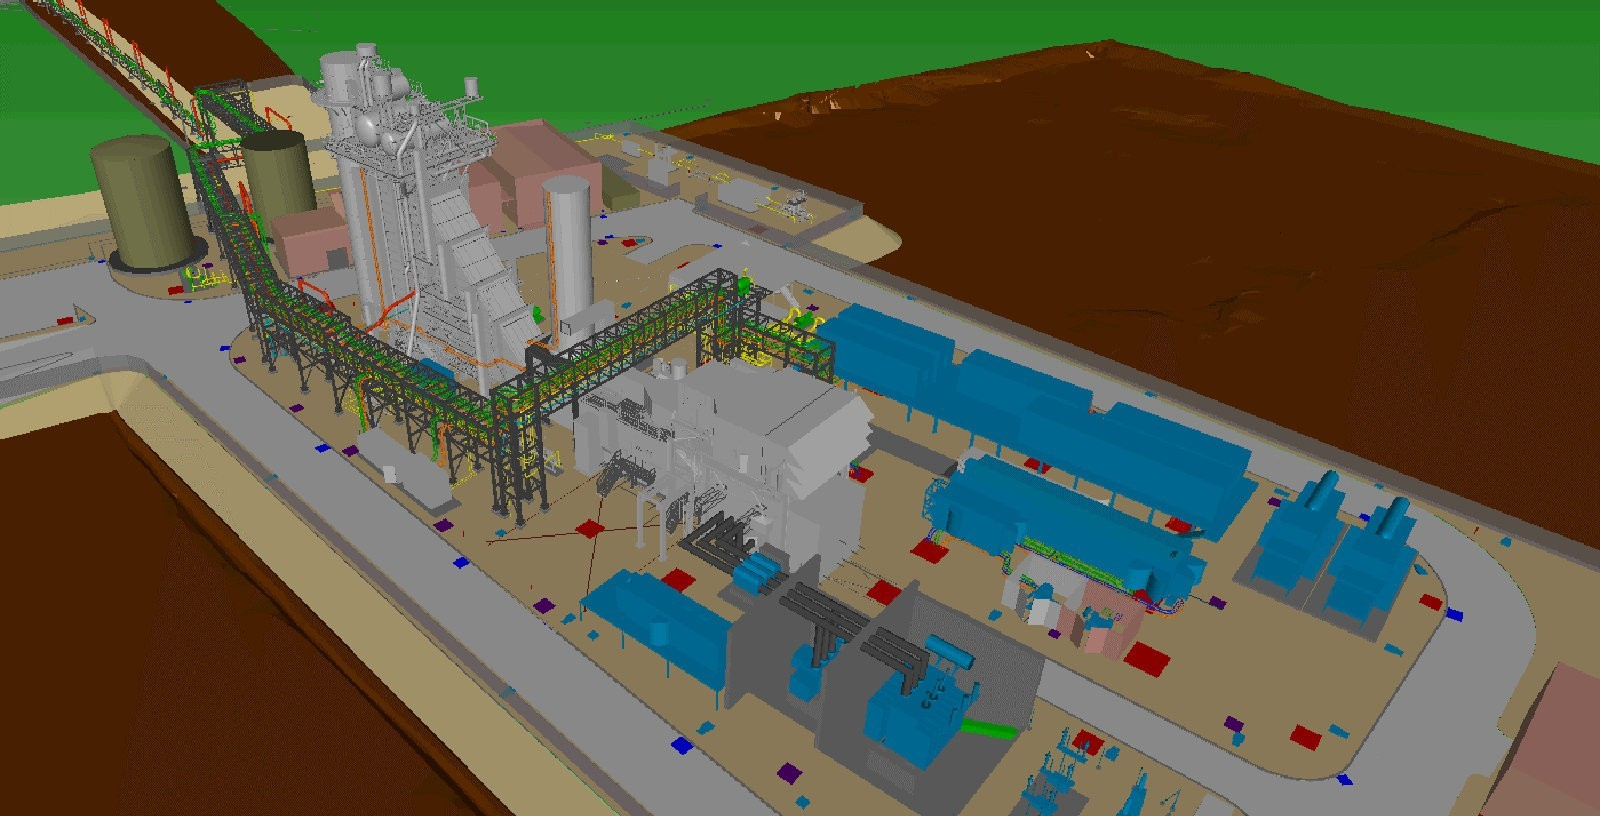 Aconcagua_Cogeneration_CCGT_Concon-Refinery_Duro-Felguera_IDOM_5